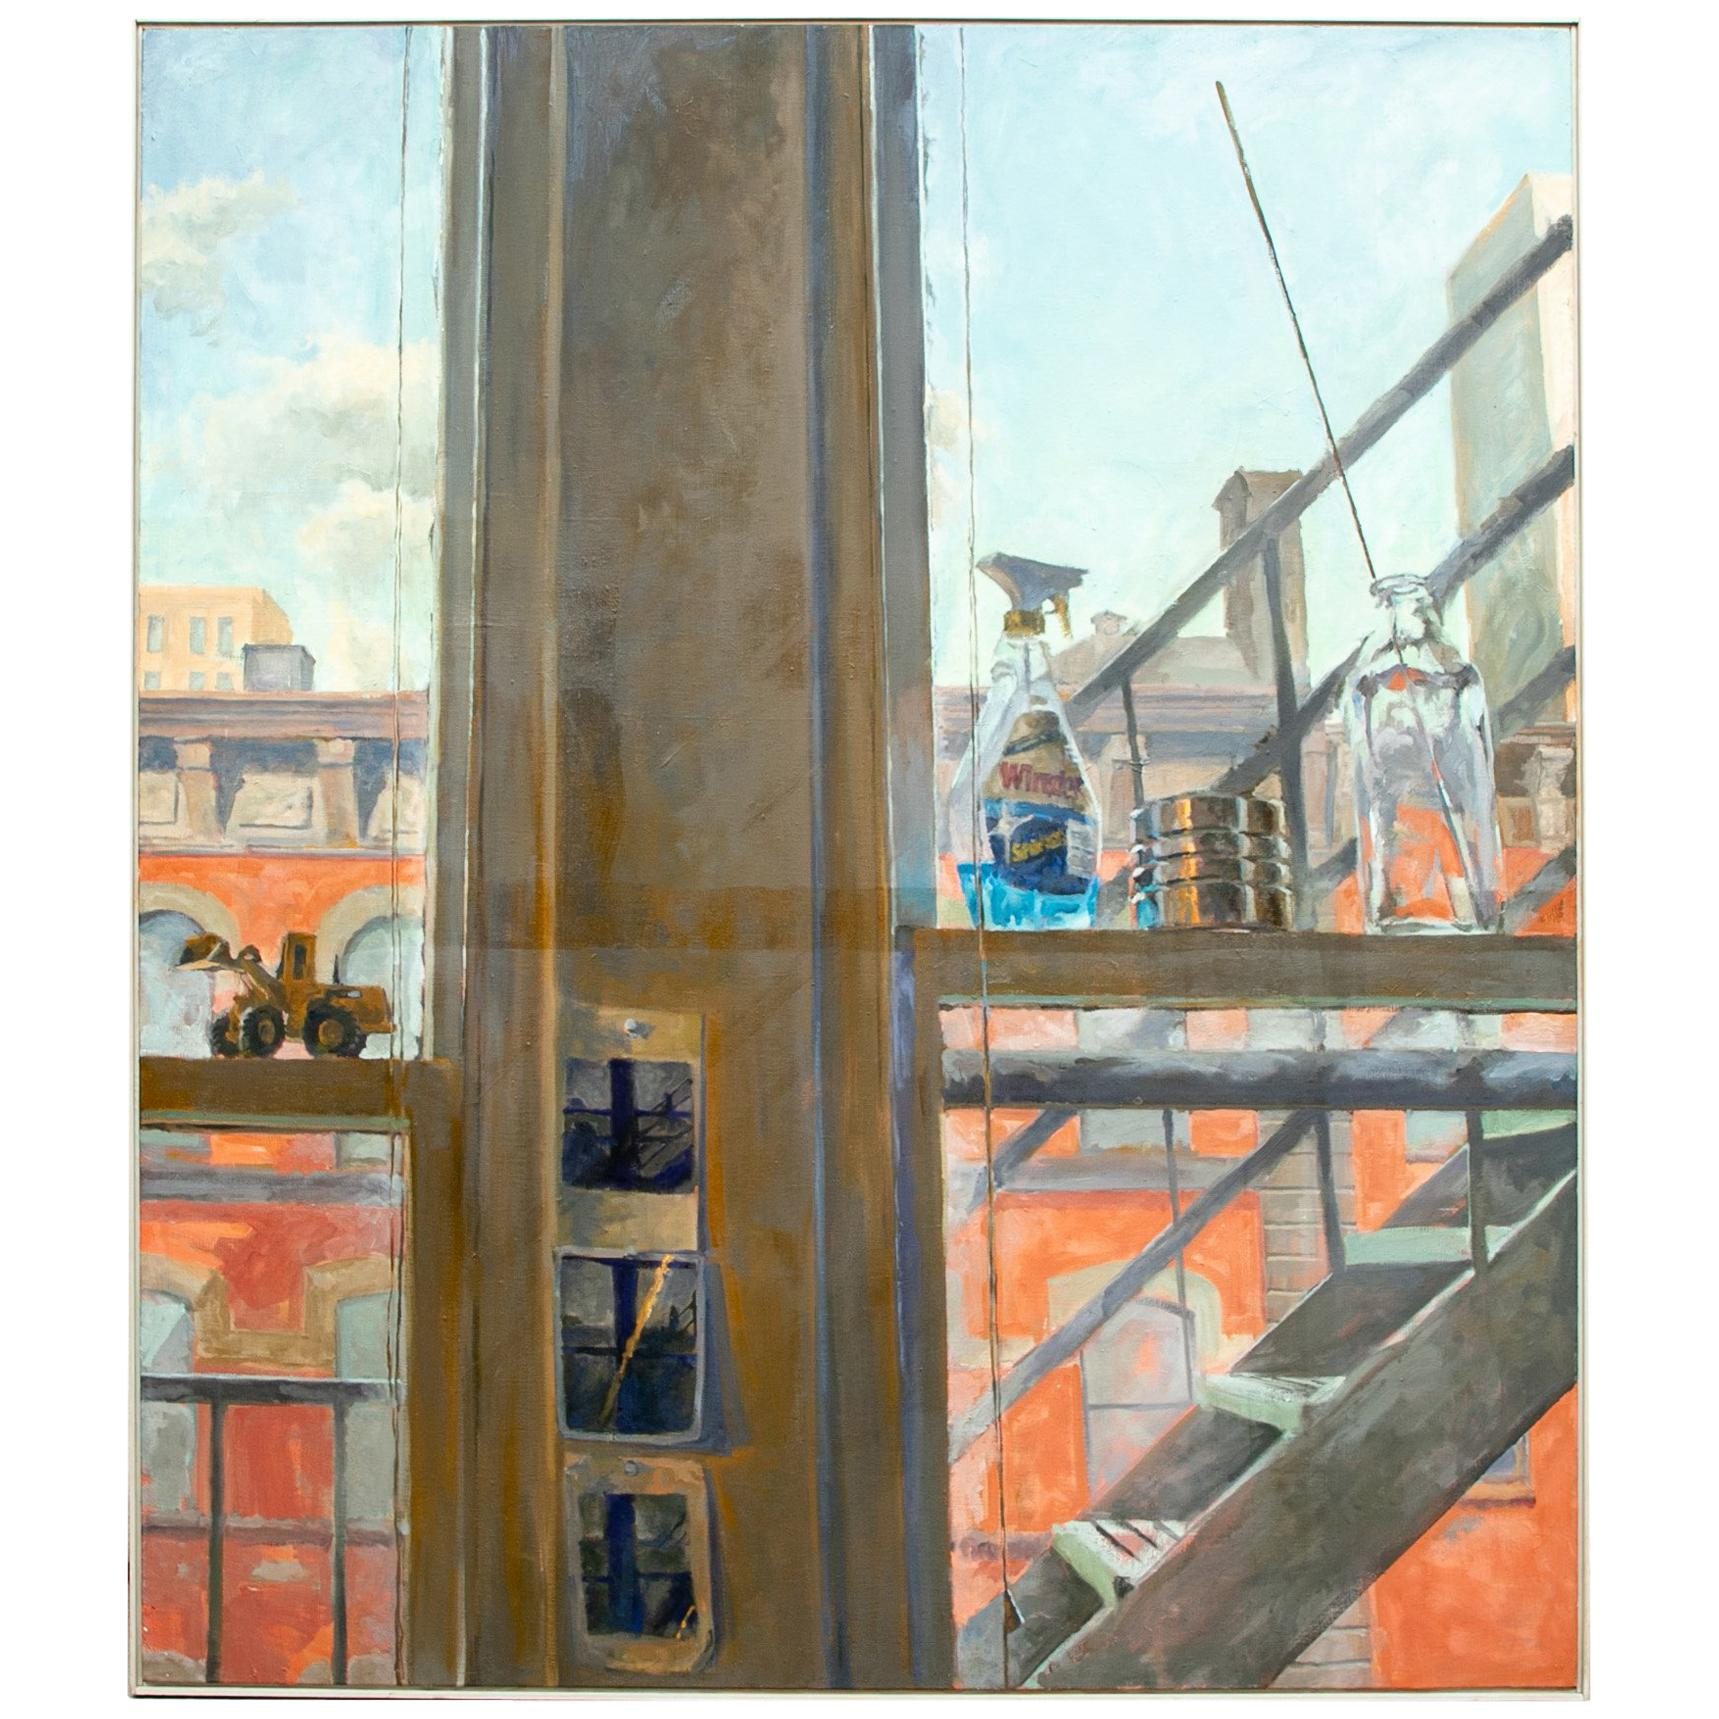 Hicks, Signed Modern Oil on Canvas, Modern Industrial Scene